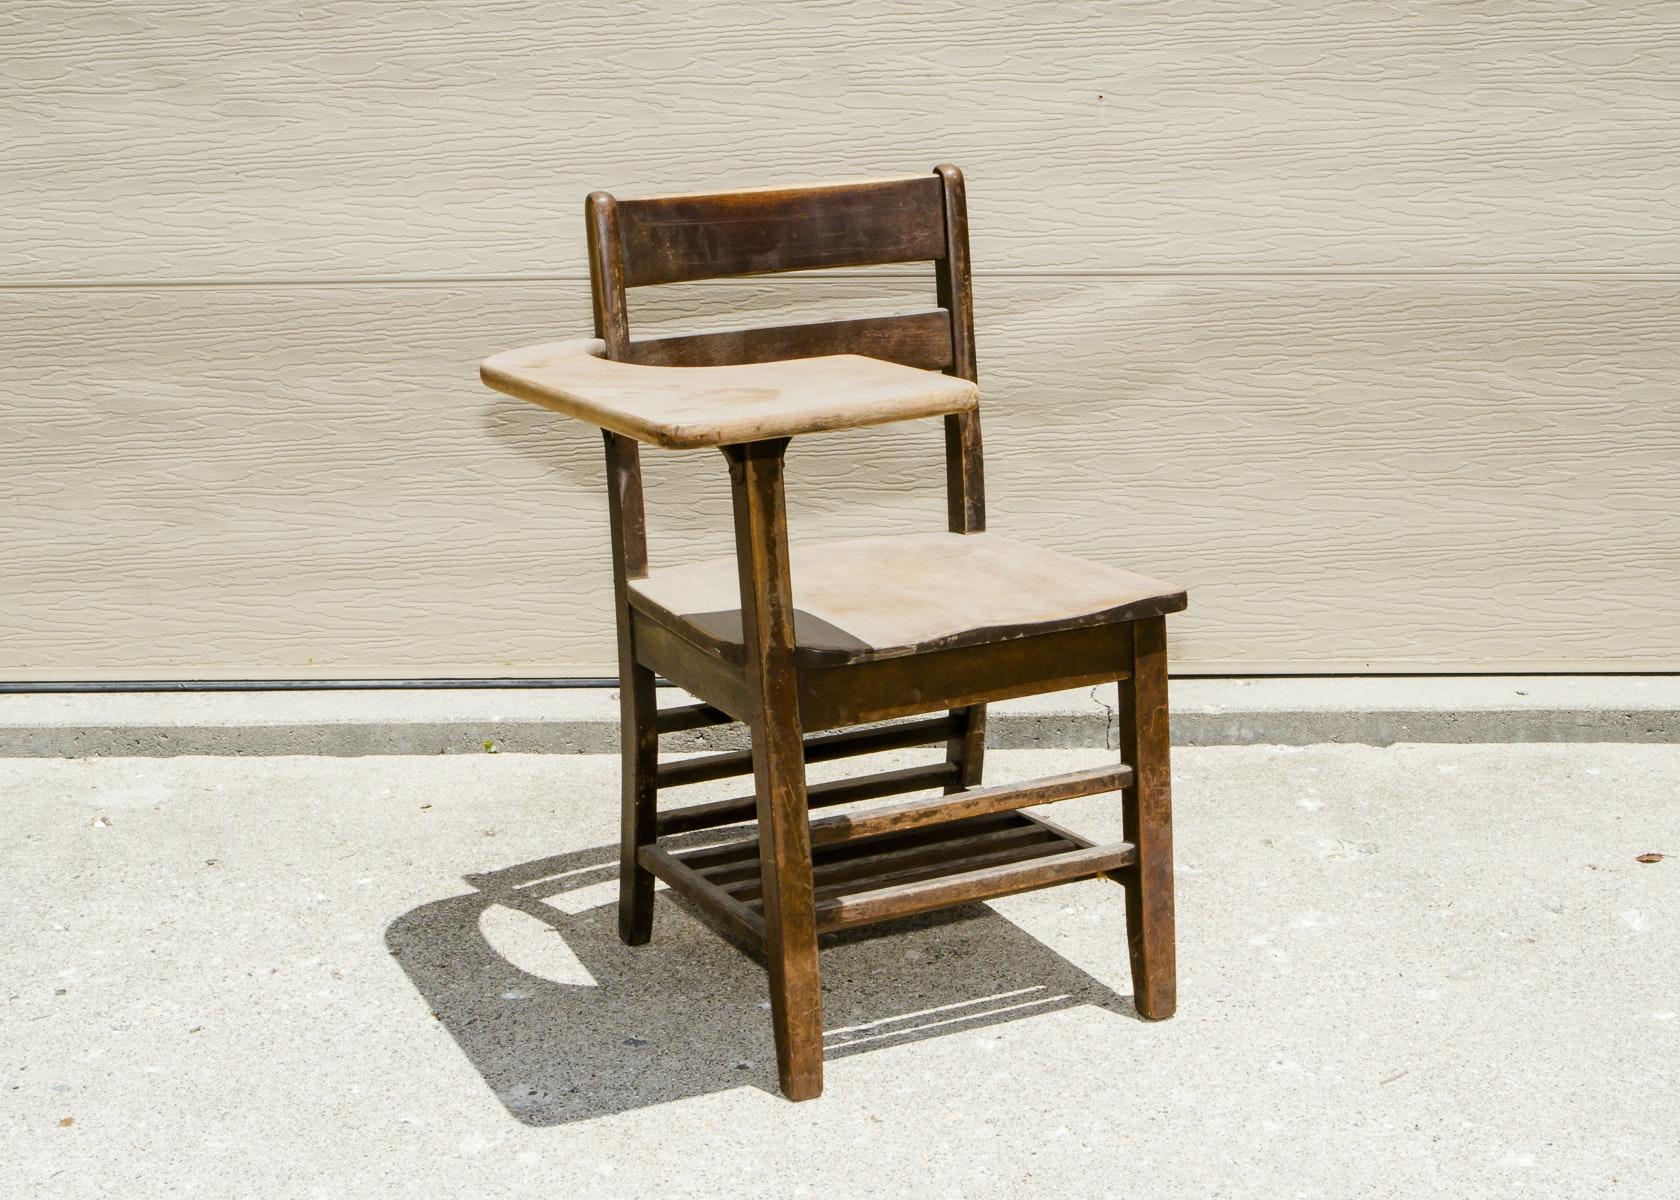 Bentwood chair vintage - Maple Wood School Desk Chair Circa 1940s Ebth